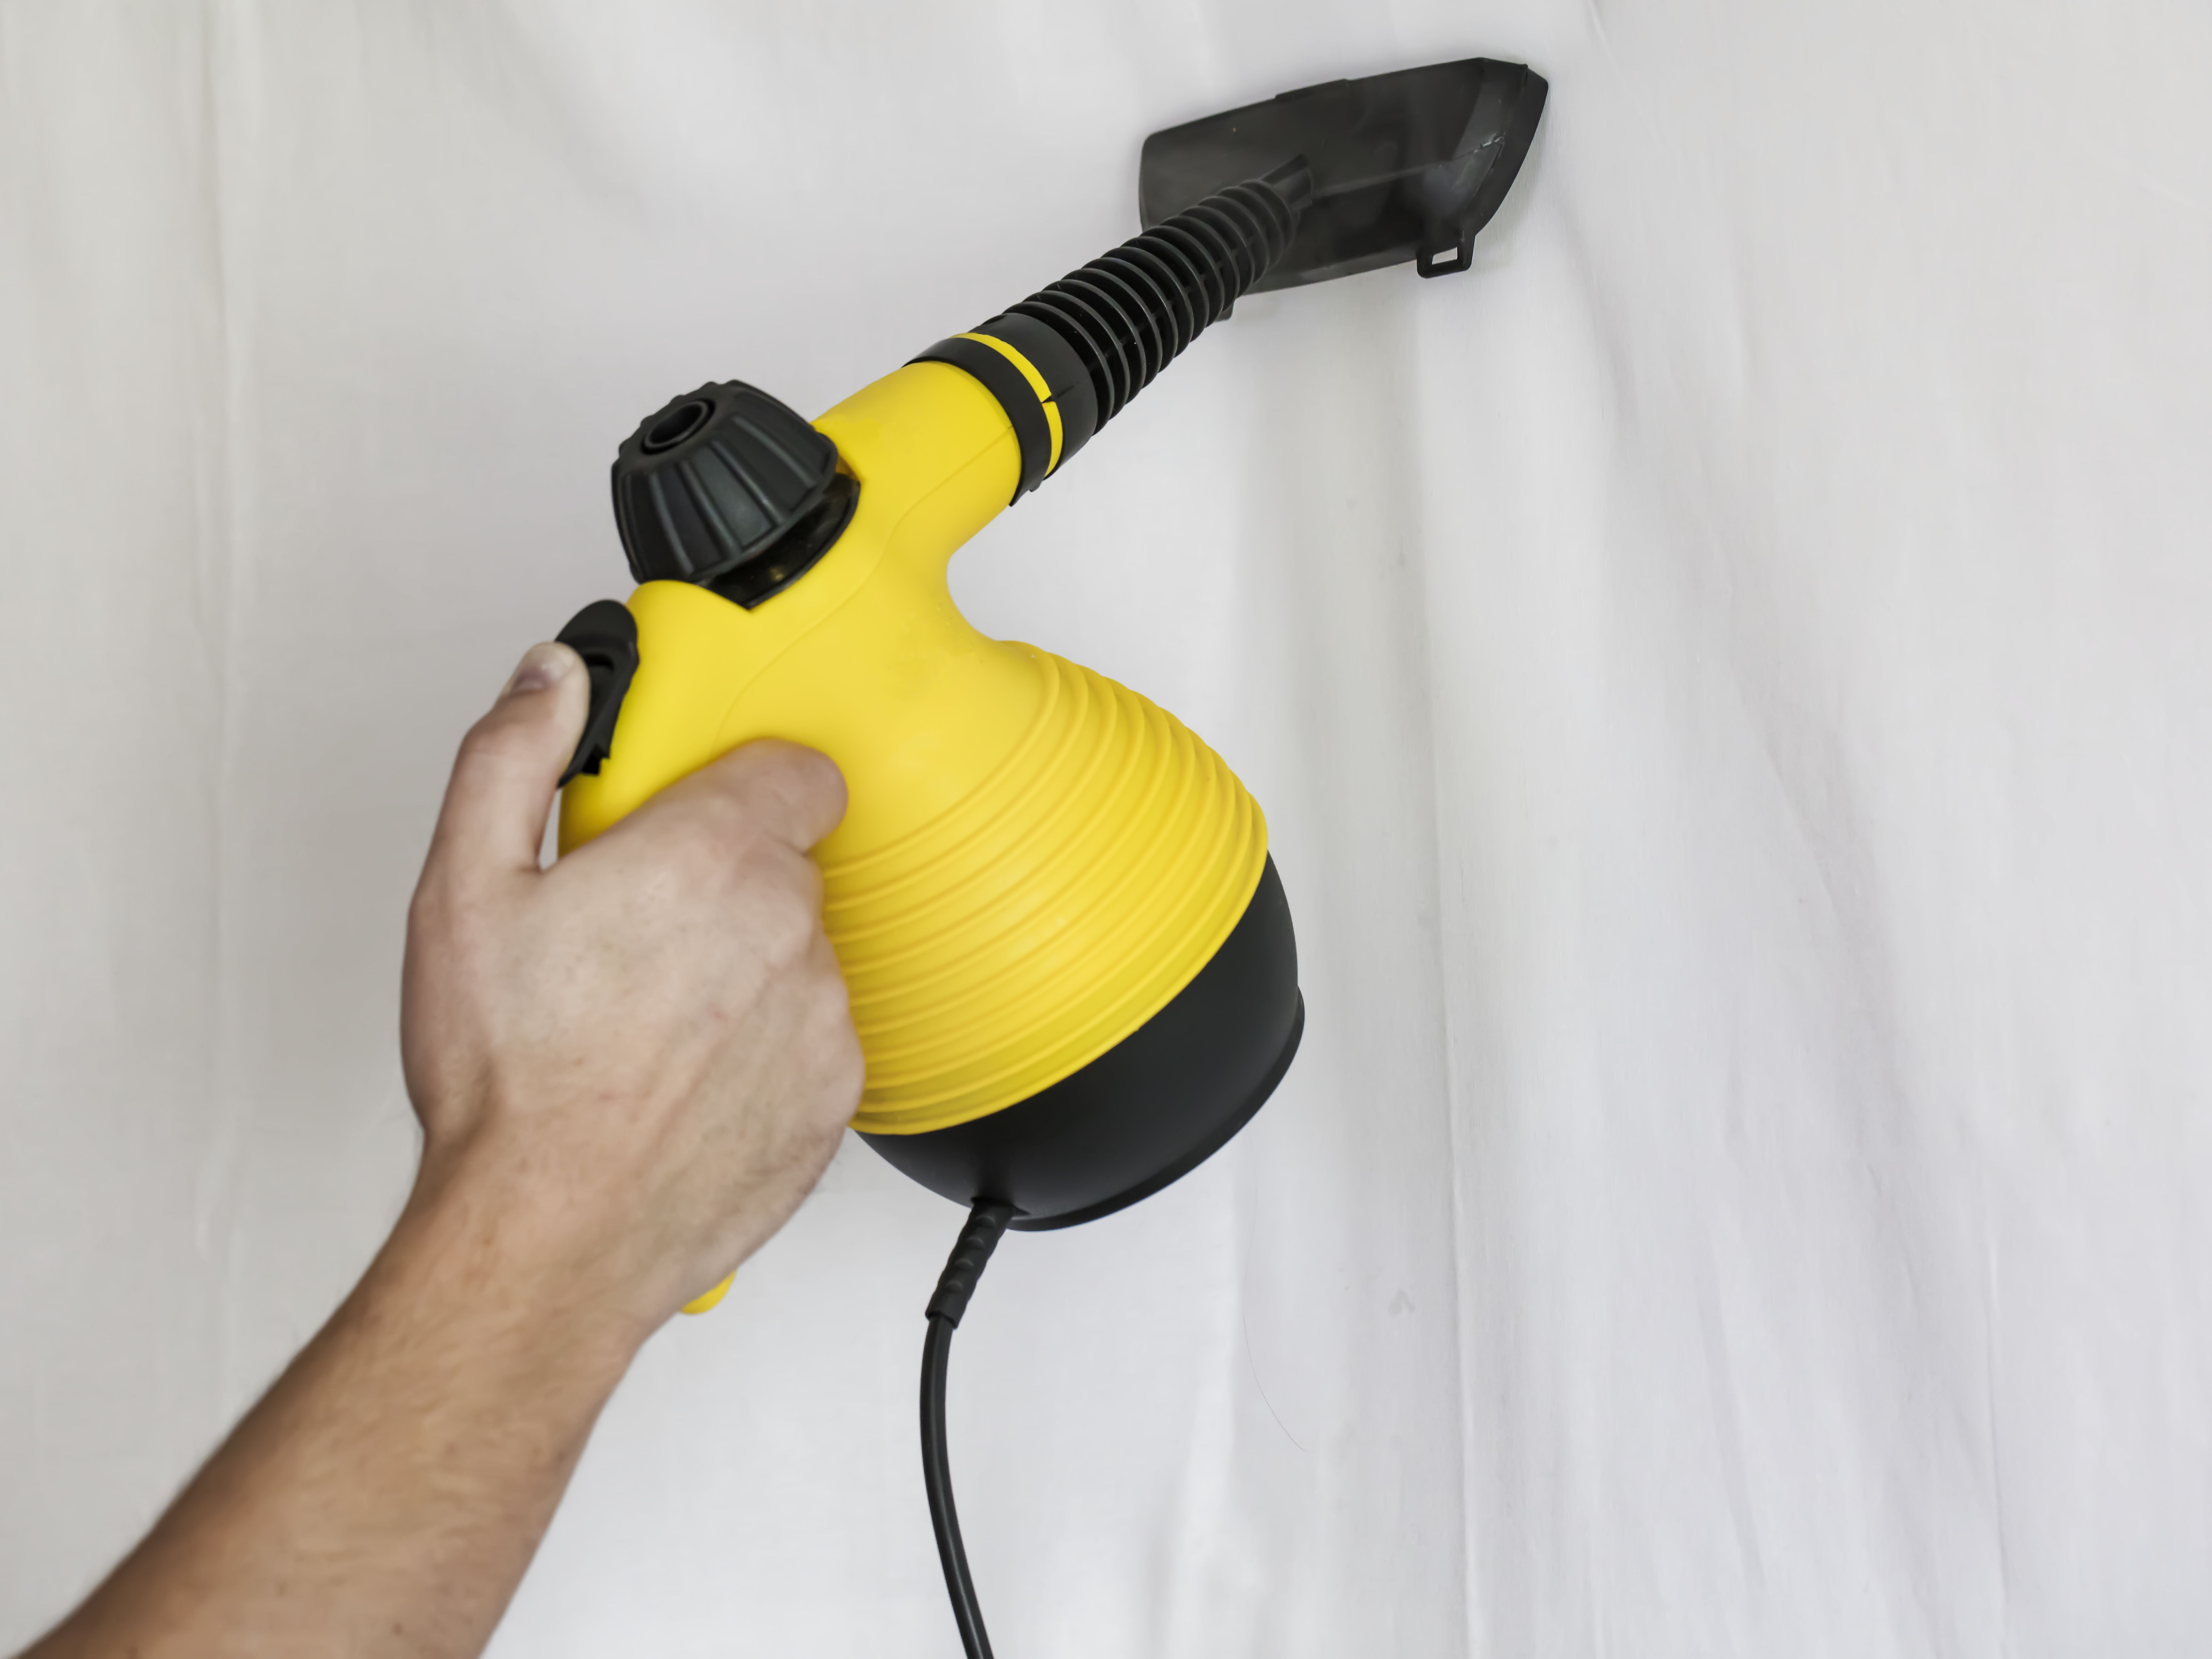 Tile Floor Steam Cleaning Machines Al Carpet Vidalondon